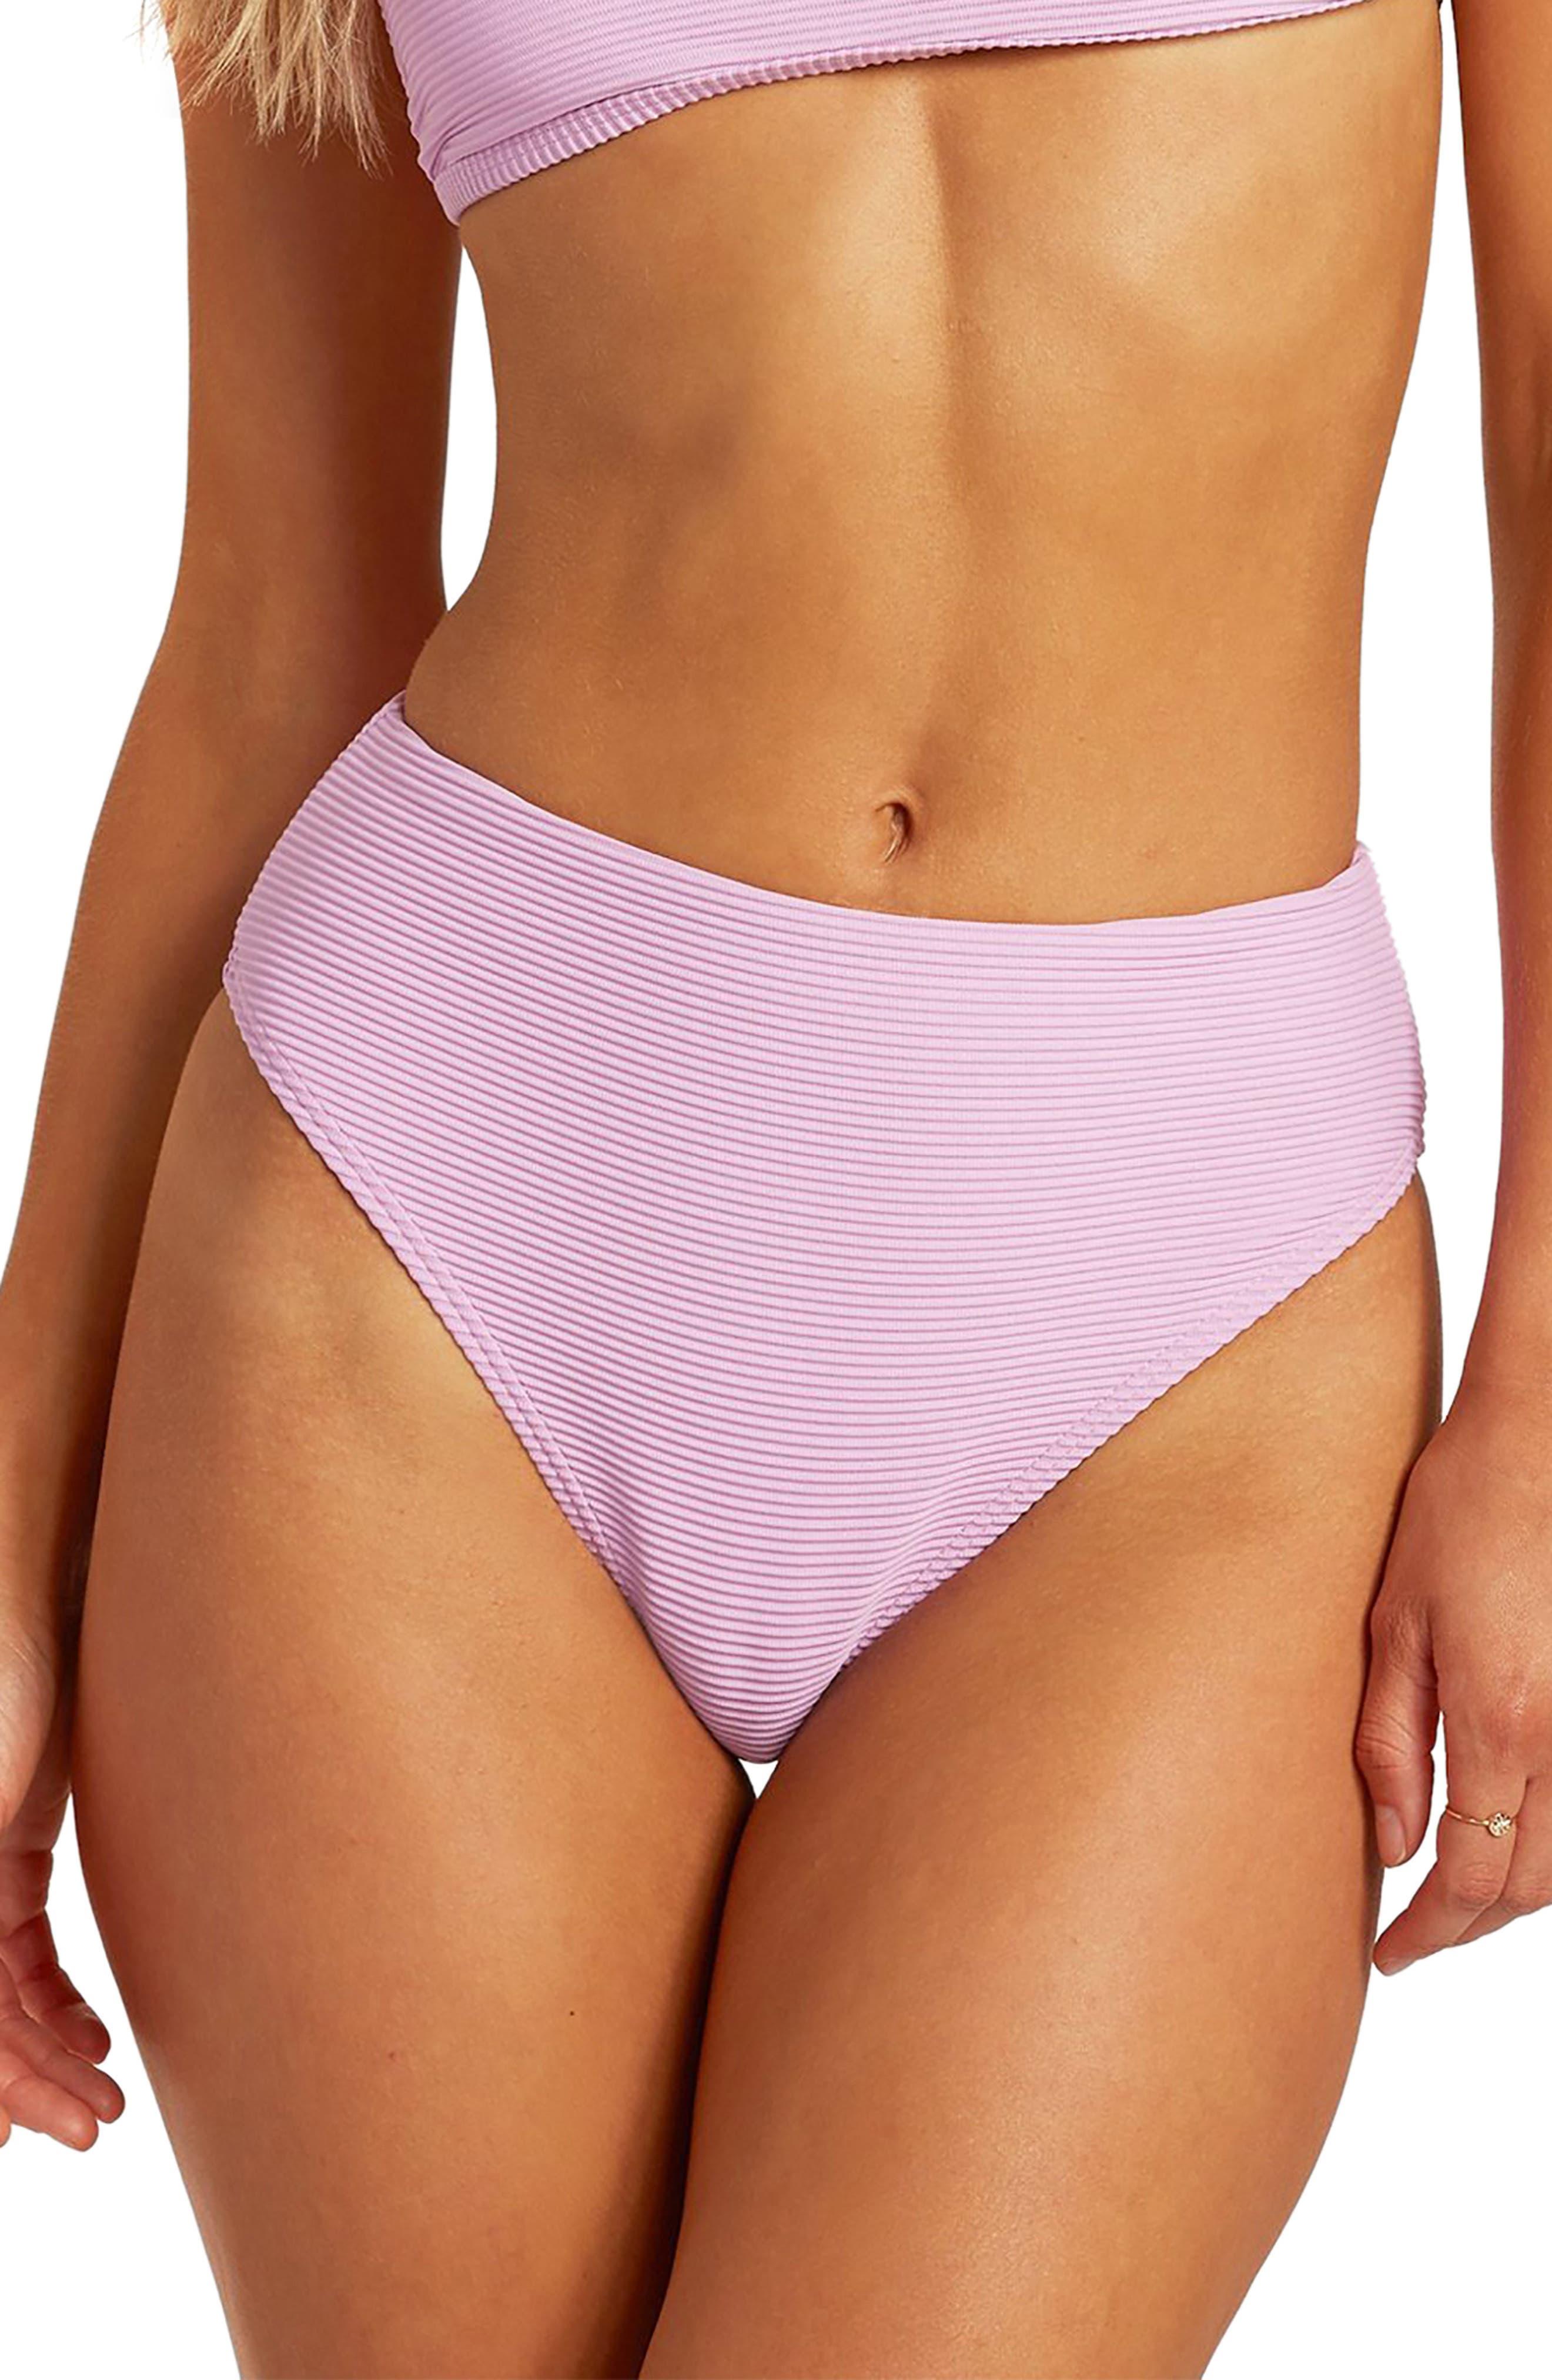 Tanlines Maui High Waist Bikini Bottoms